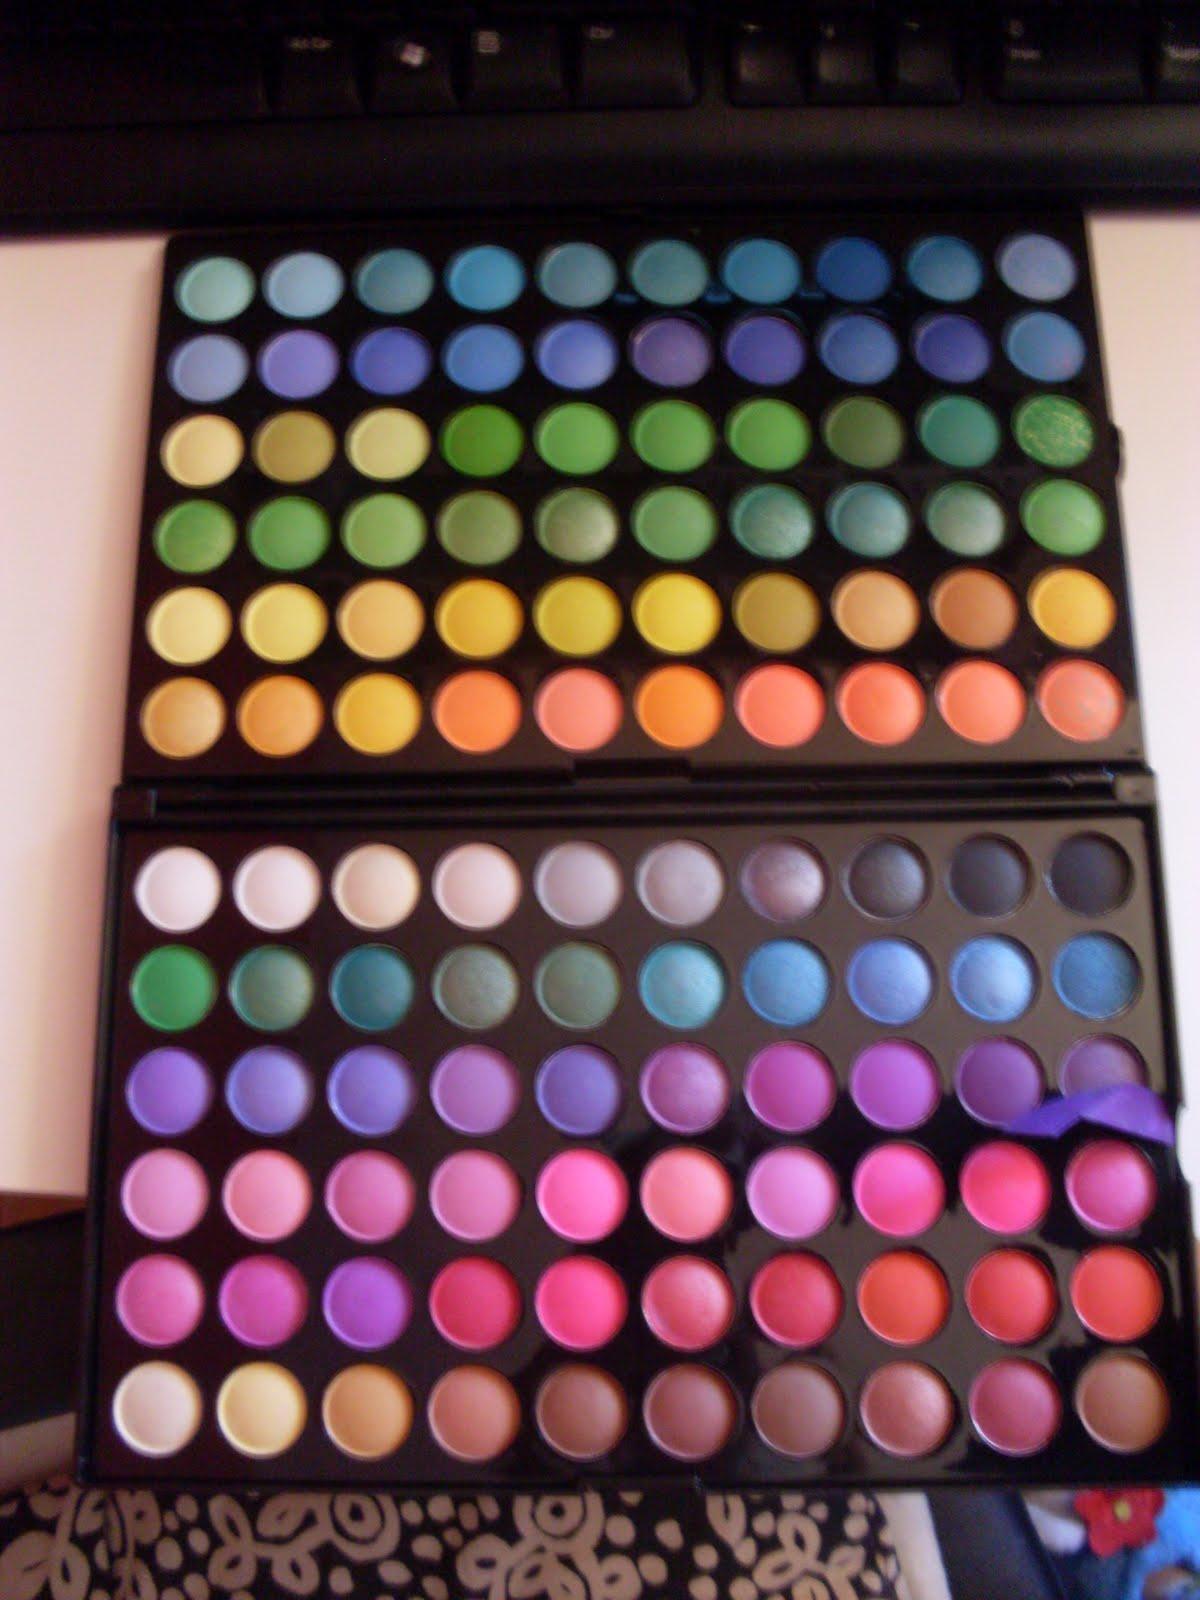 Amazon.com : BHCosmetics 120 Color Eyeshadow Palette - 1st